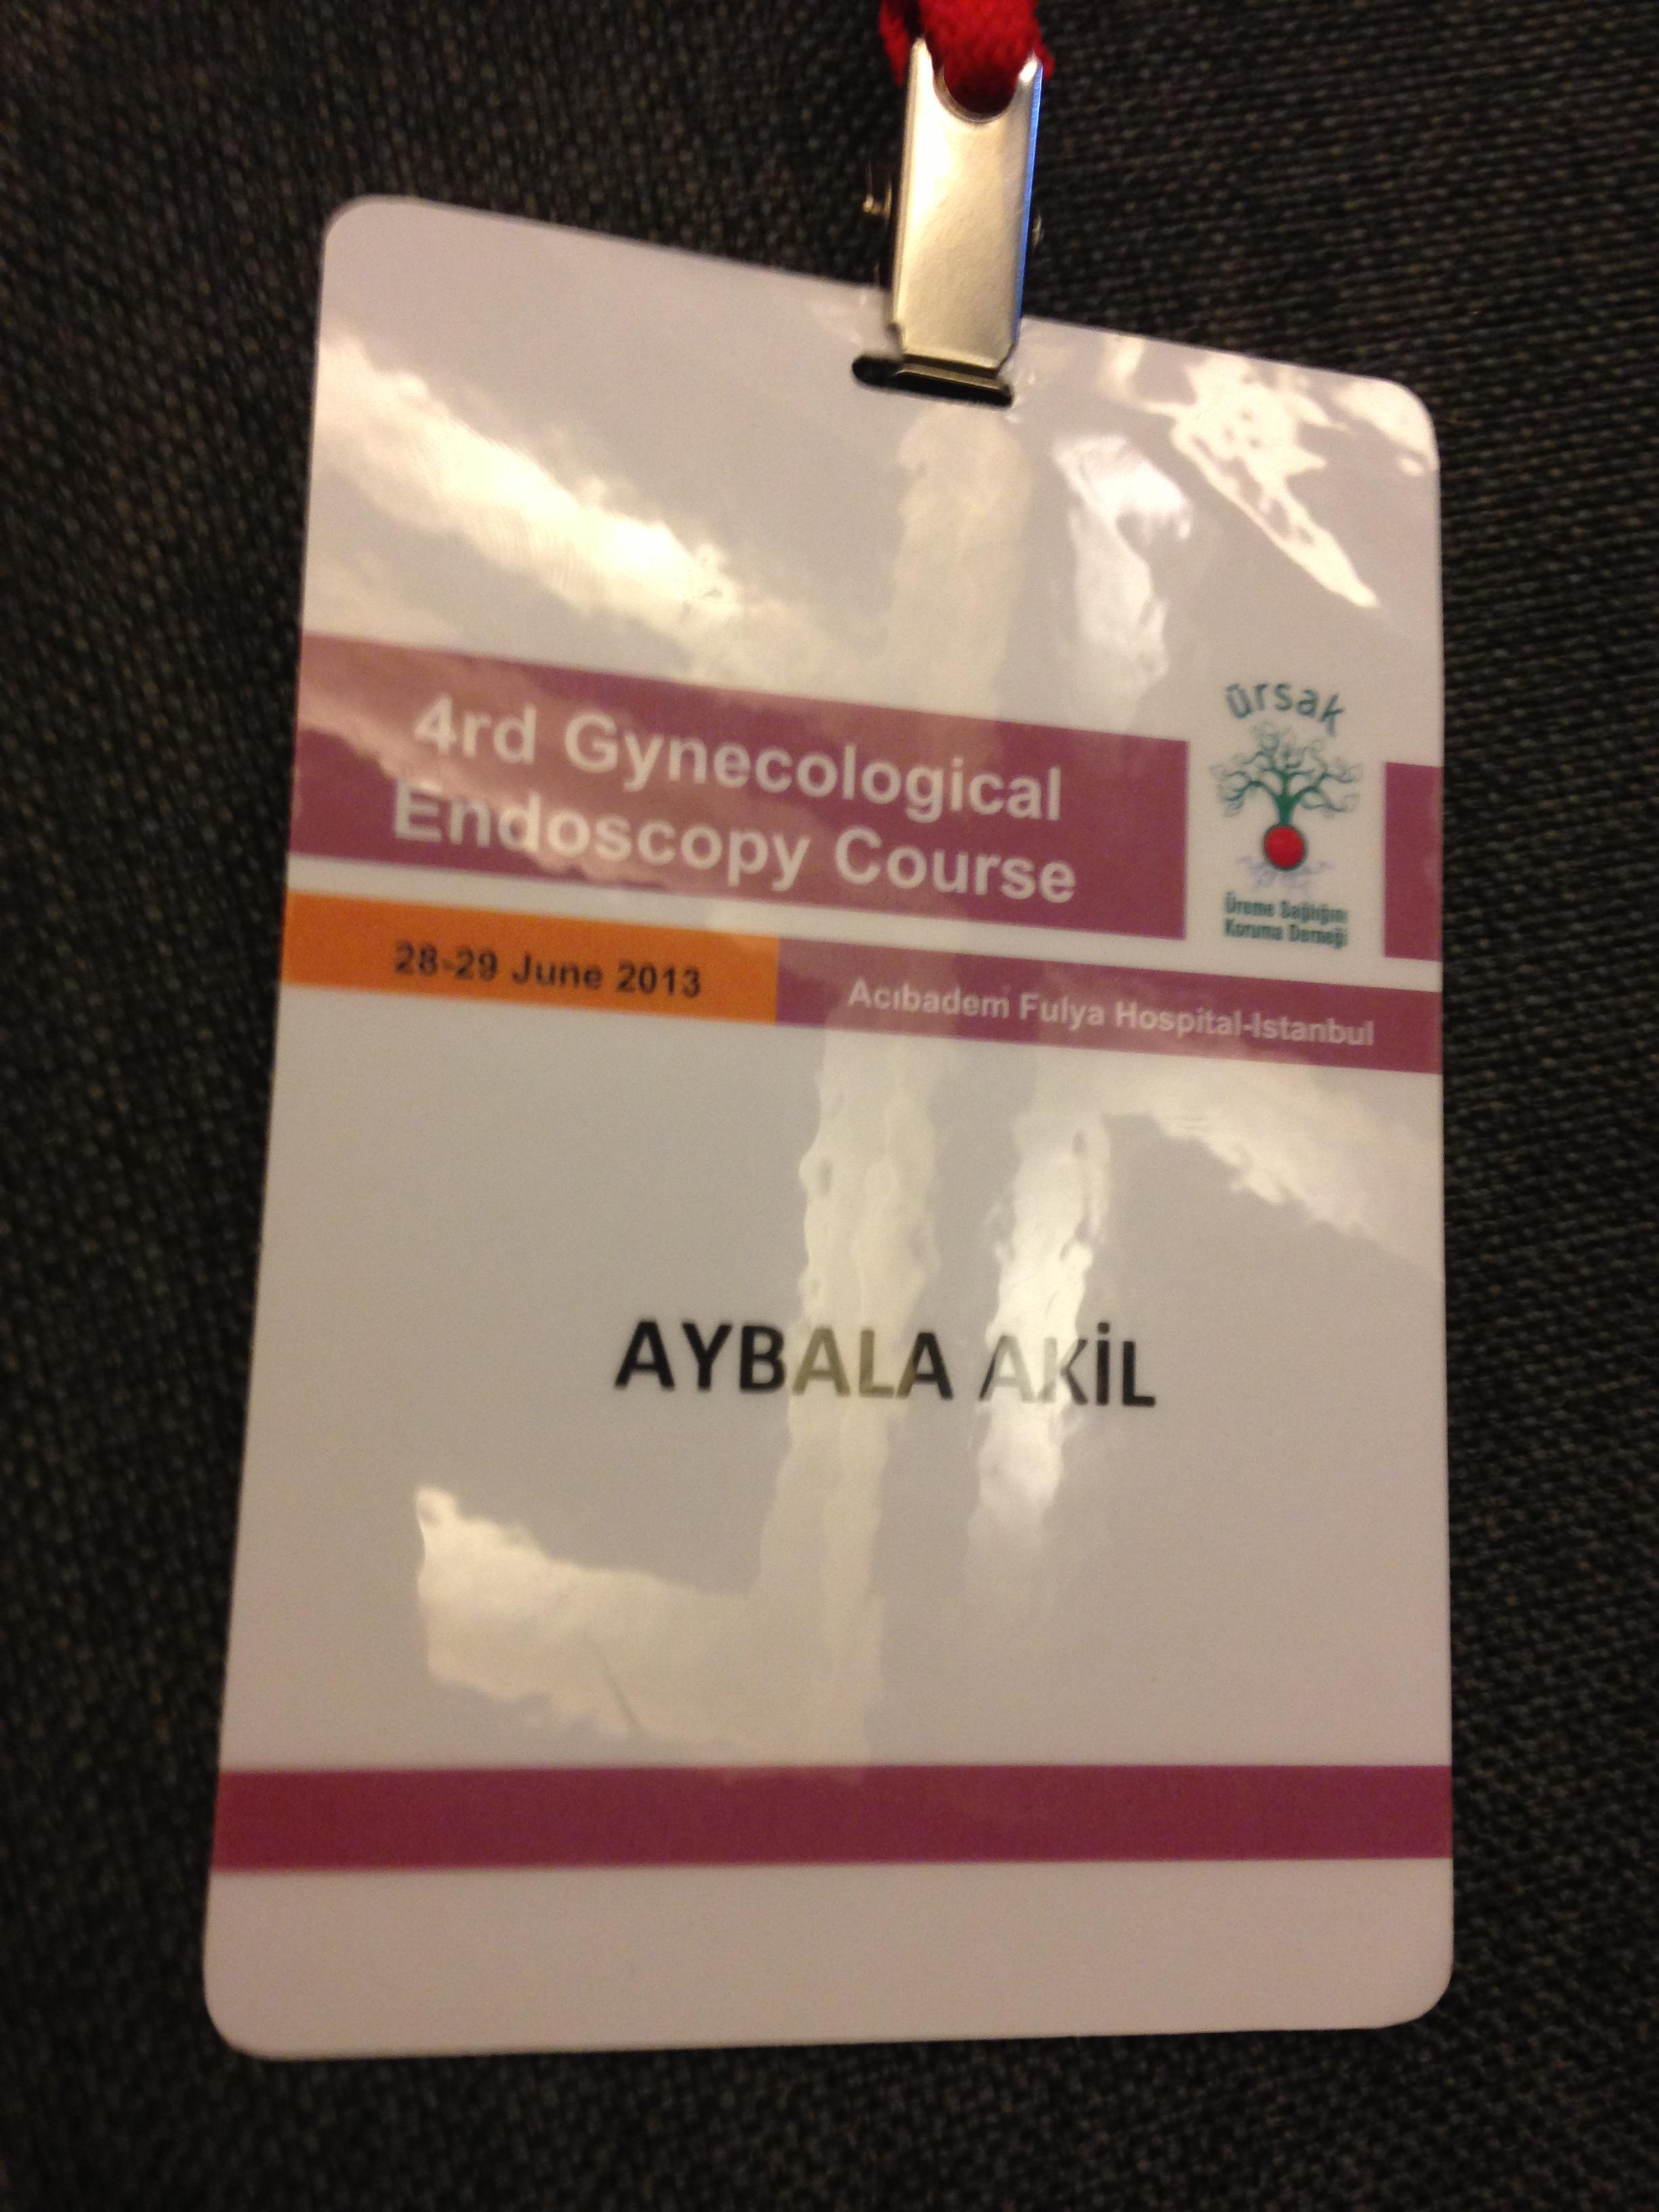 4. Jinekolojik Endoskopi Kursu gerçekleşti